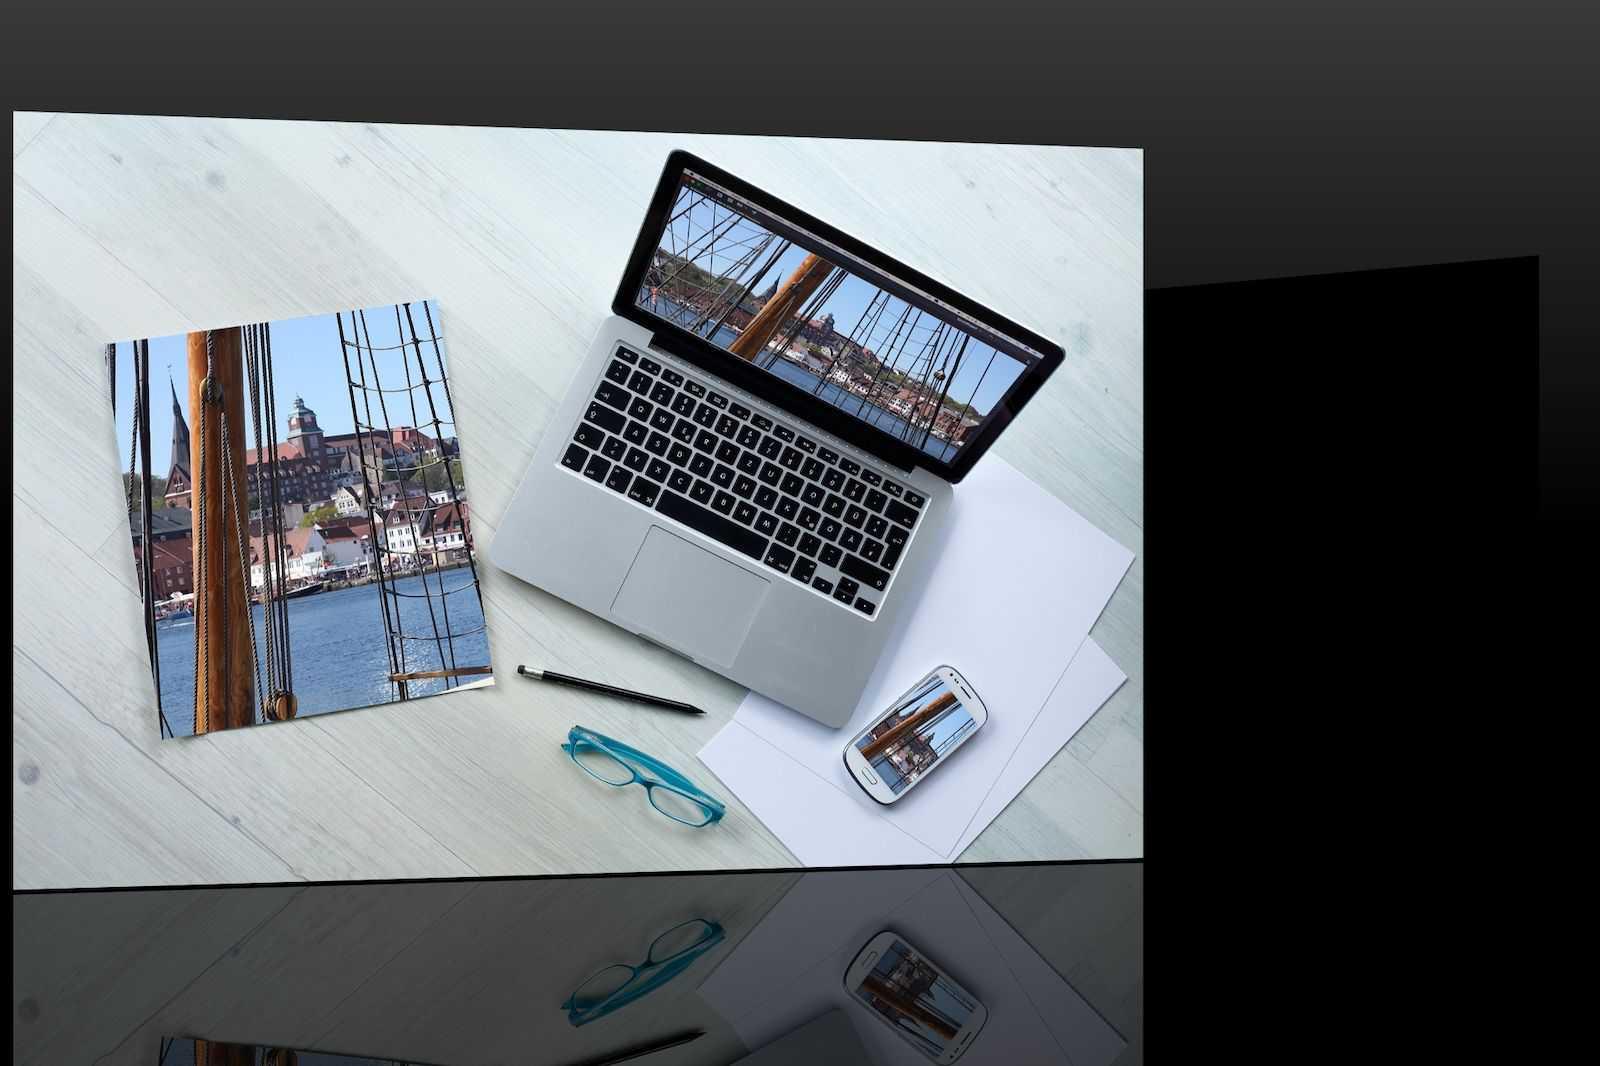 iPhone・Macで開いているWebぺージを即座に同期してそれぞれのデバイスで表示する方法